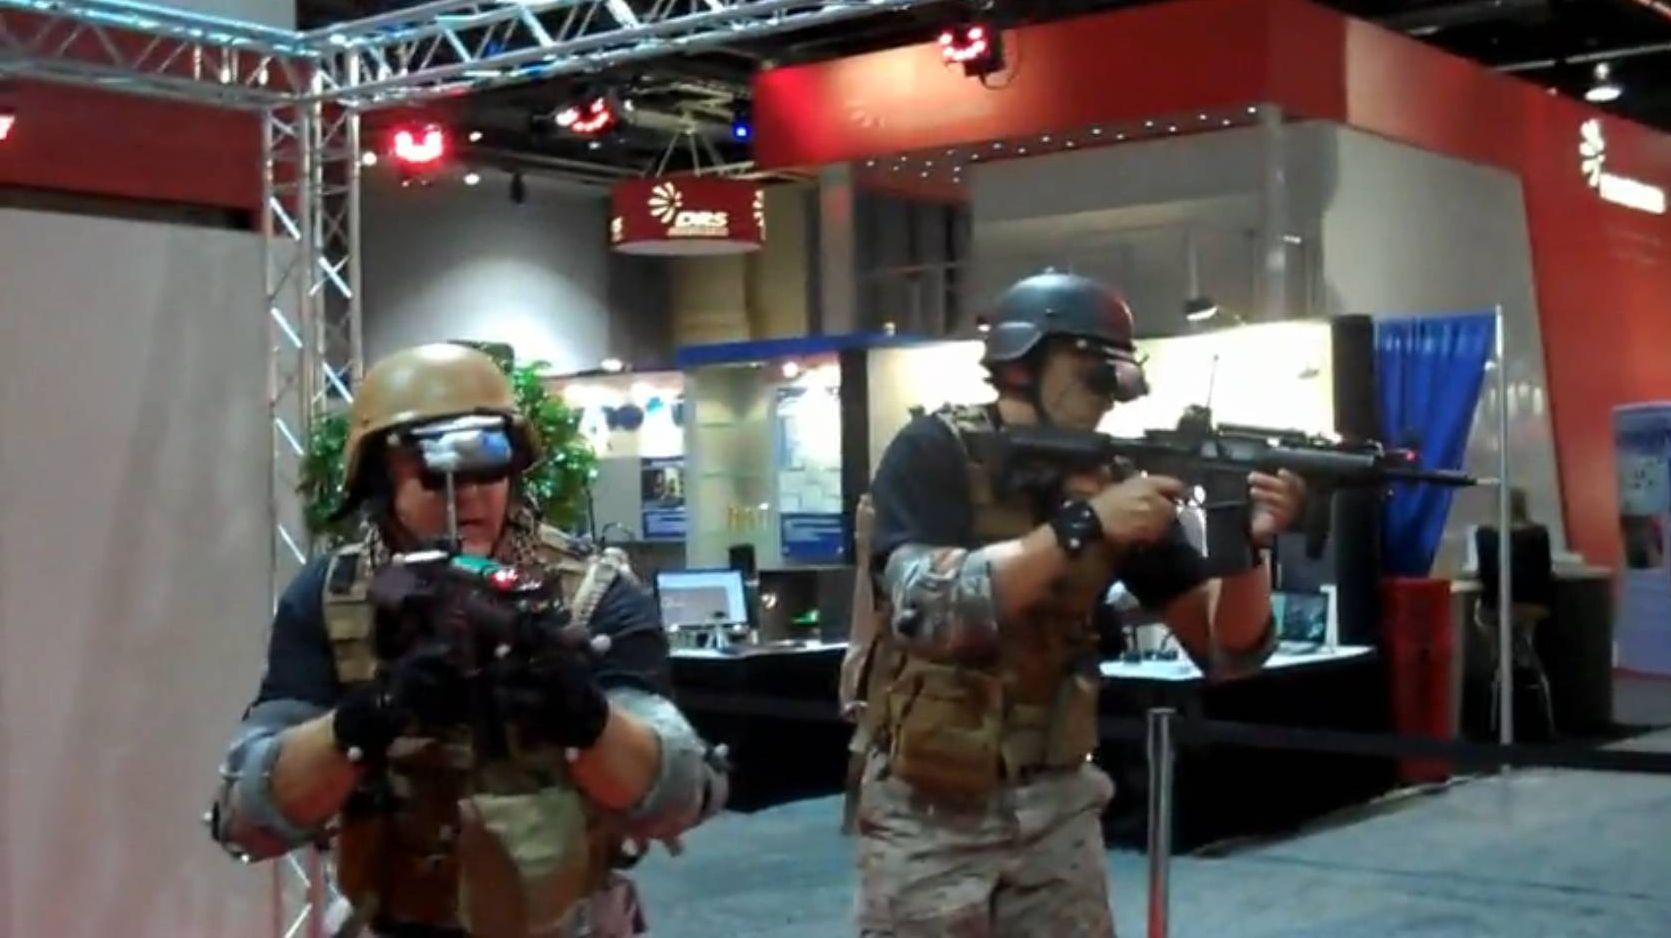 Video: Raytheon's Free Roaming Combat Simulator Lets You Feel Getting Shot